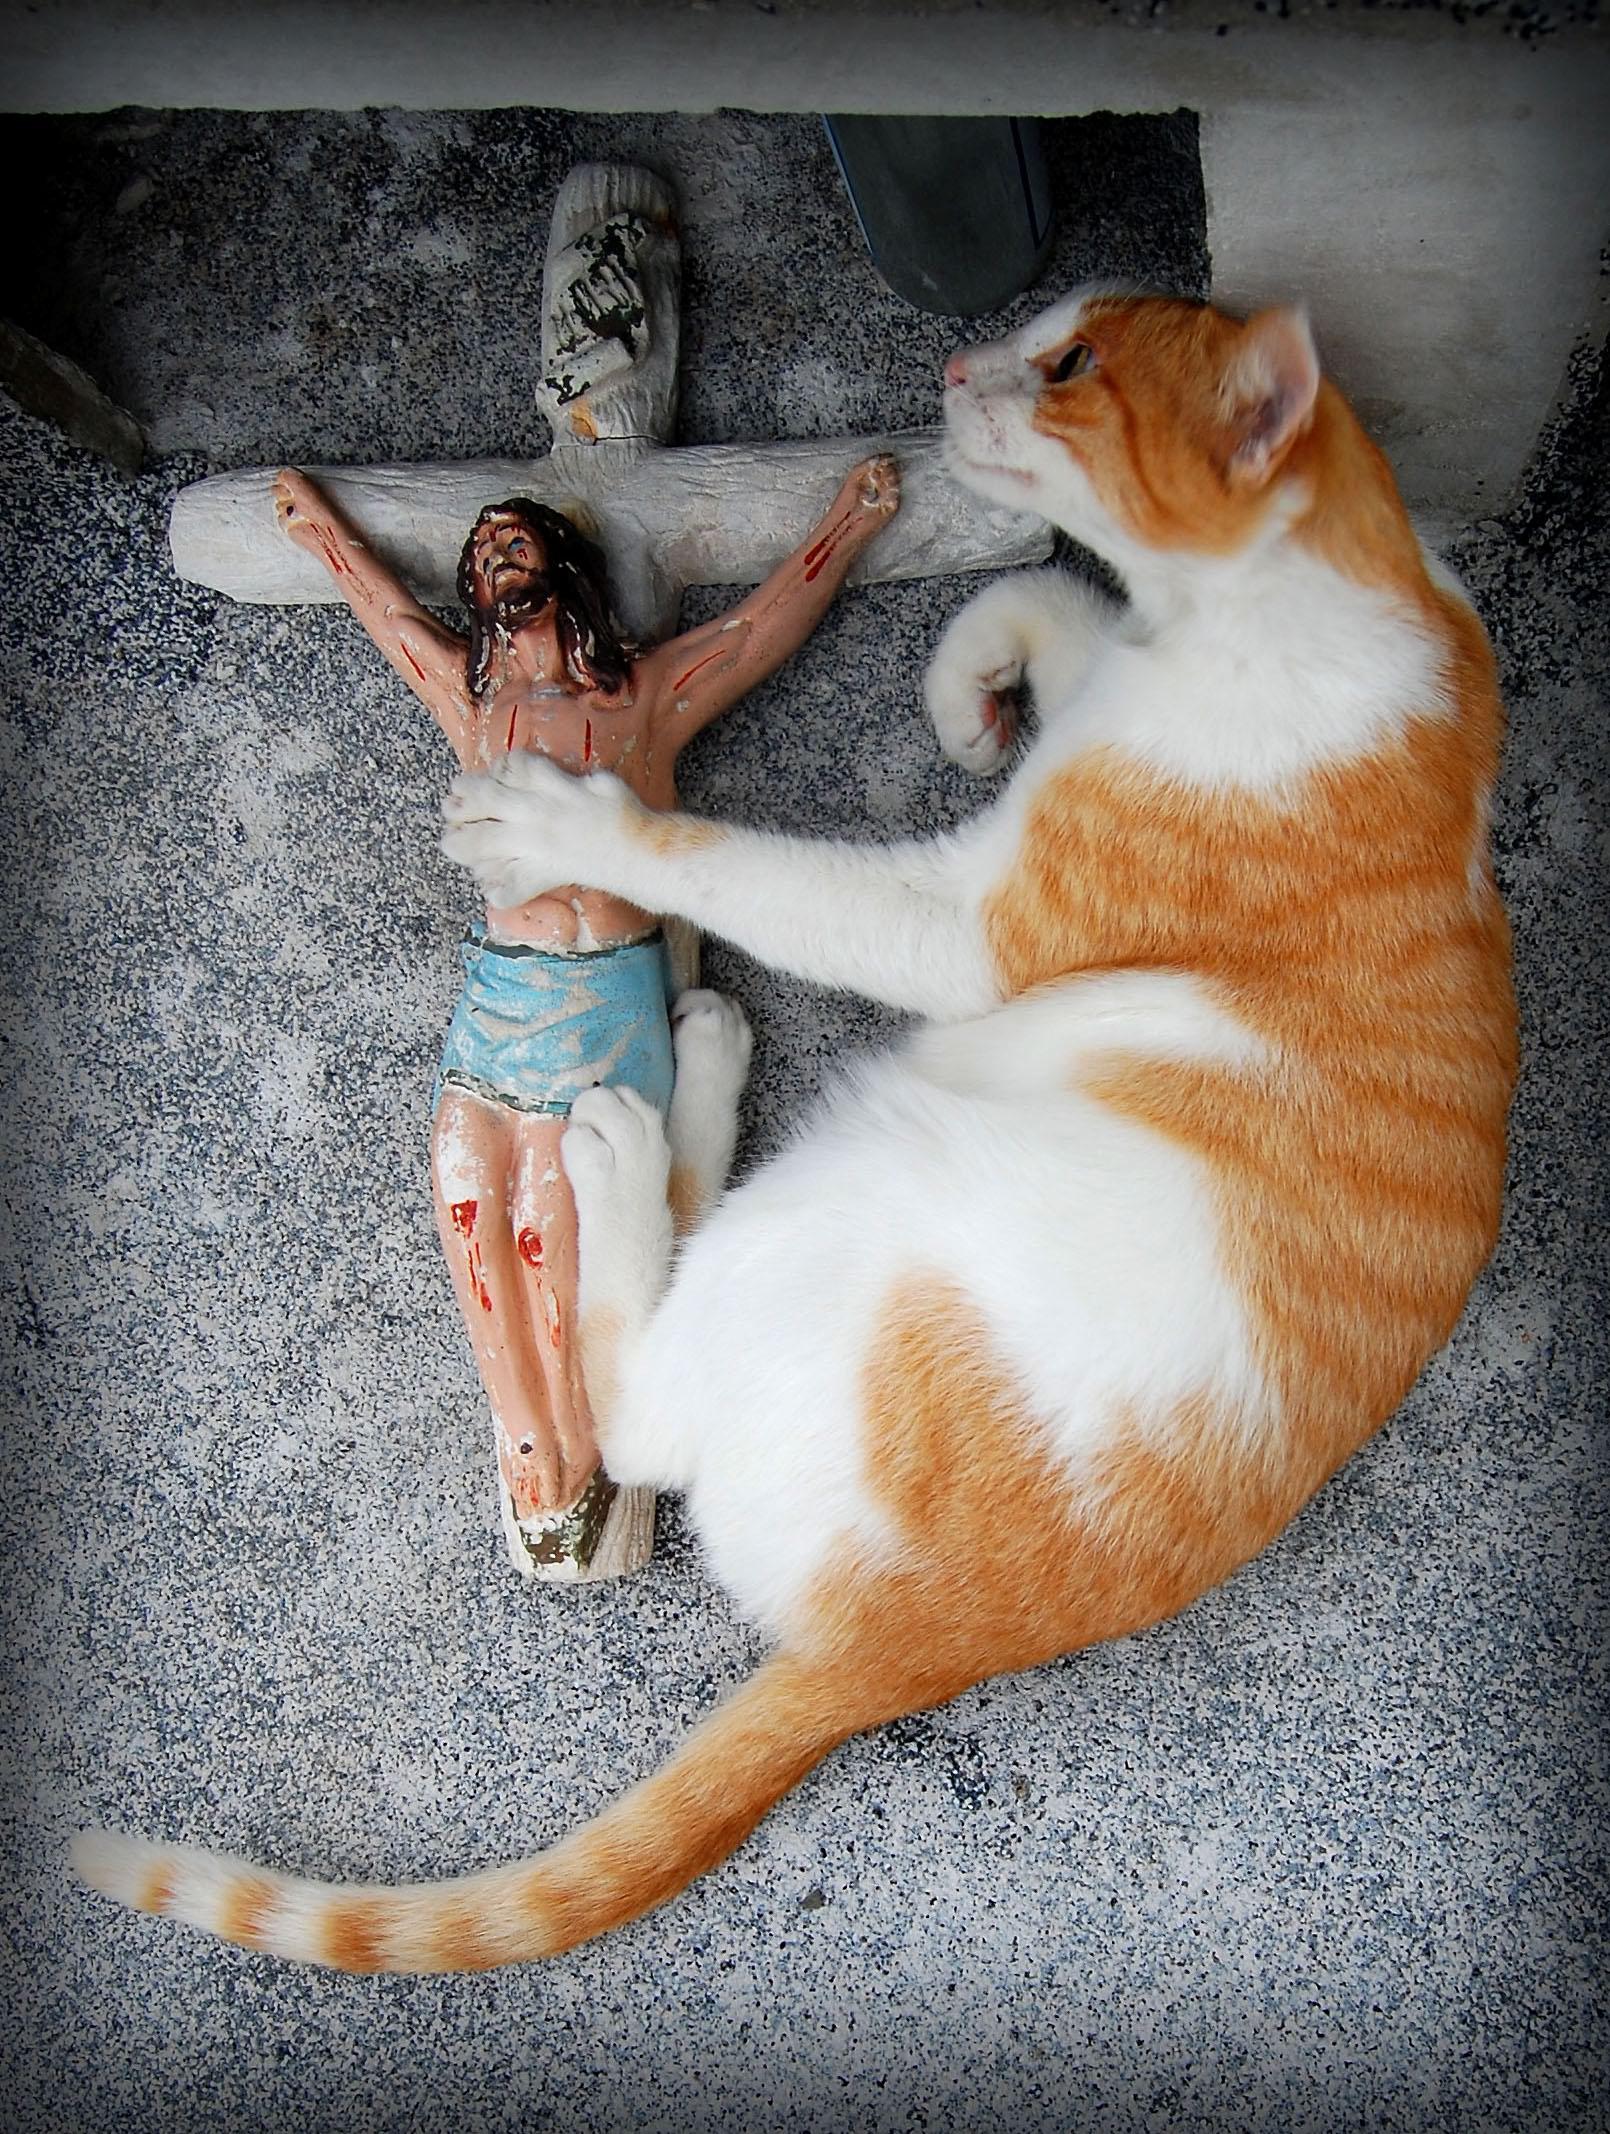 Crucifix Cat 171 Why Evolution Is True